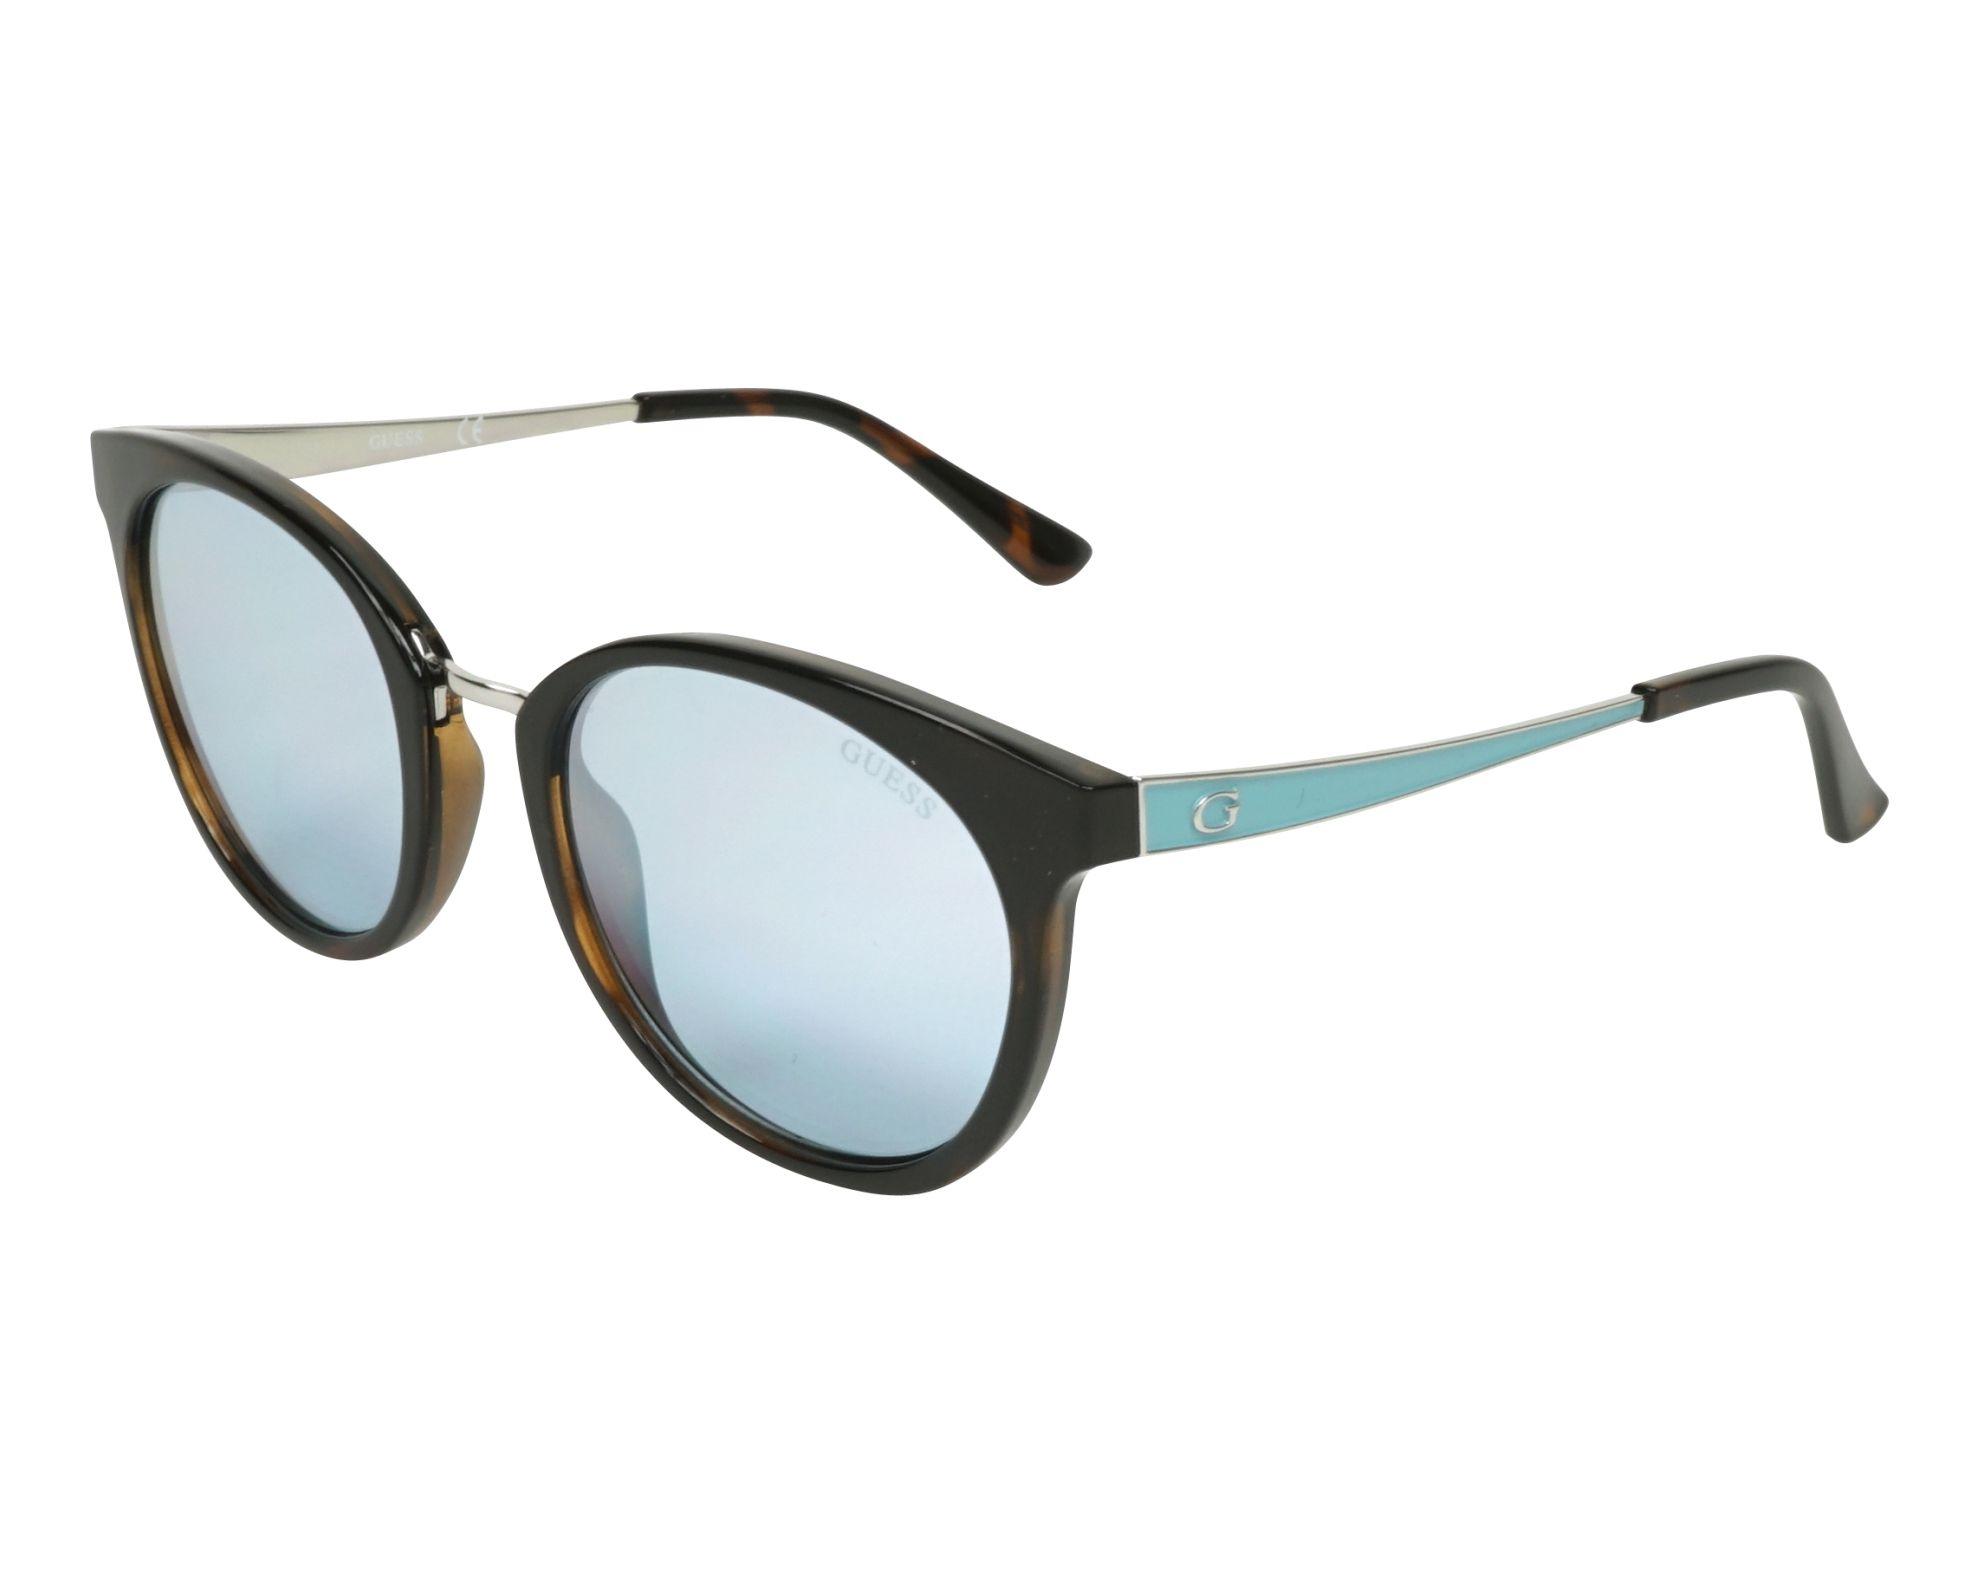 a3c0130abd3 ... Sunglasses Guess GU-7459-S 52C 52-20 Brown Silver profile view sale ...